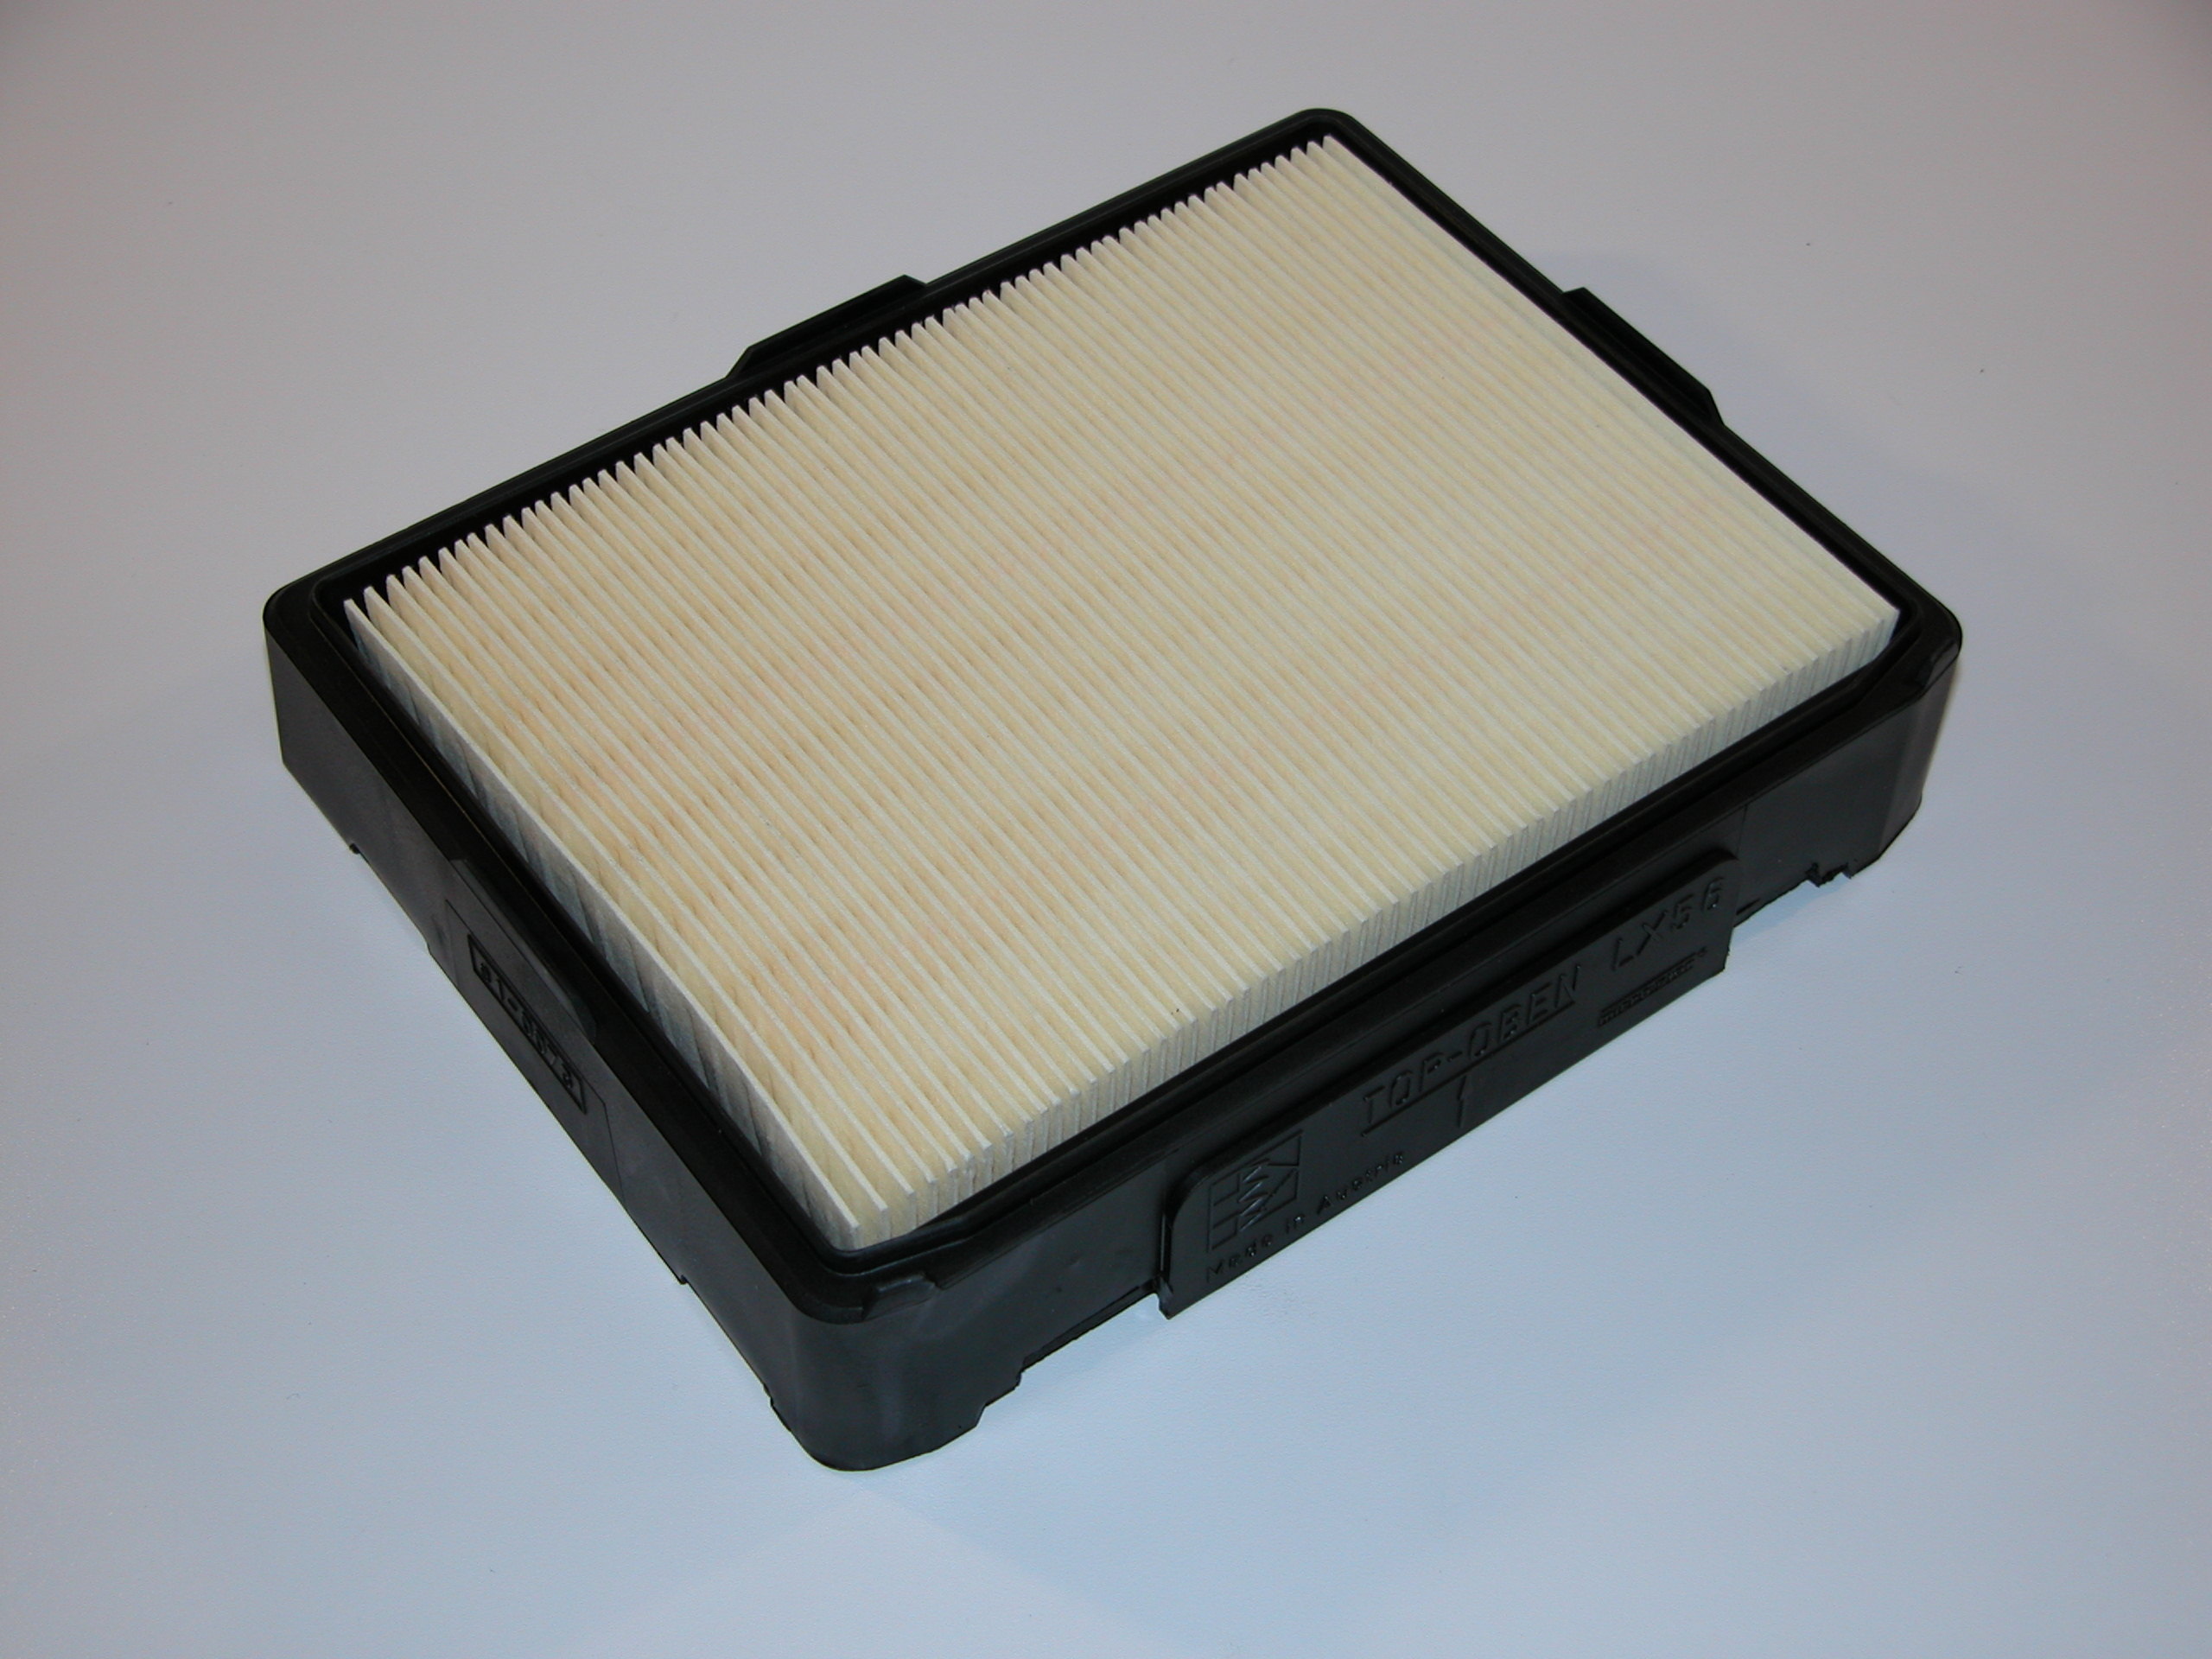 Luftfilter, LX 56 2-V-Boxer ab 09 1980